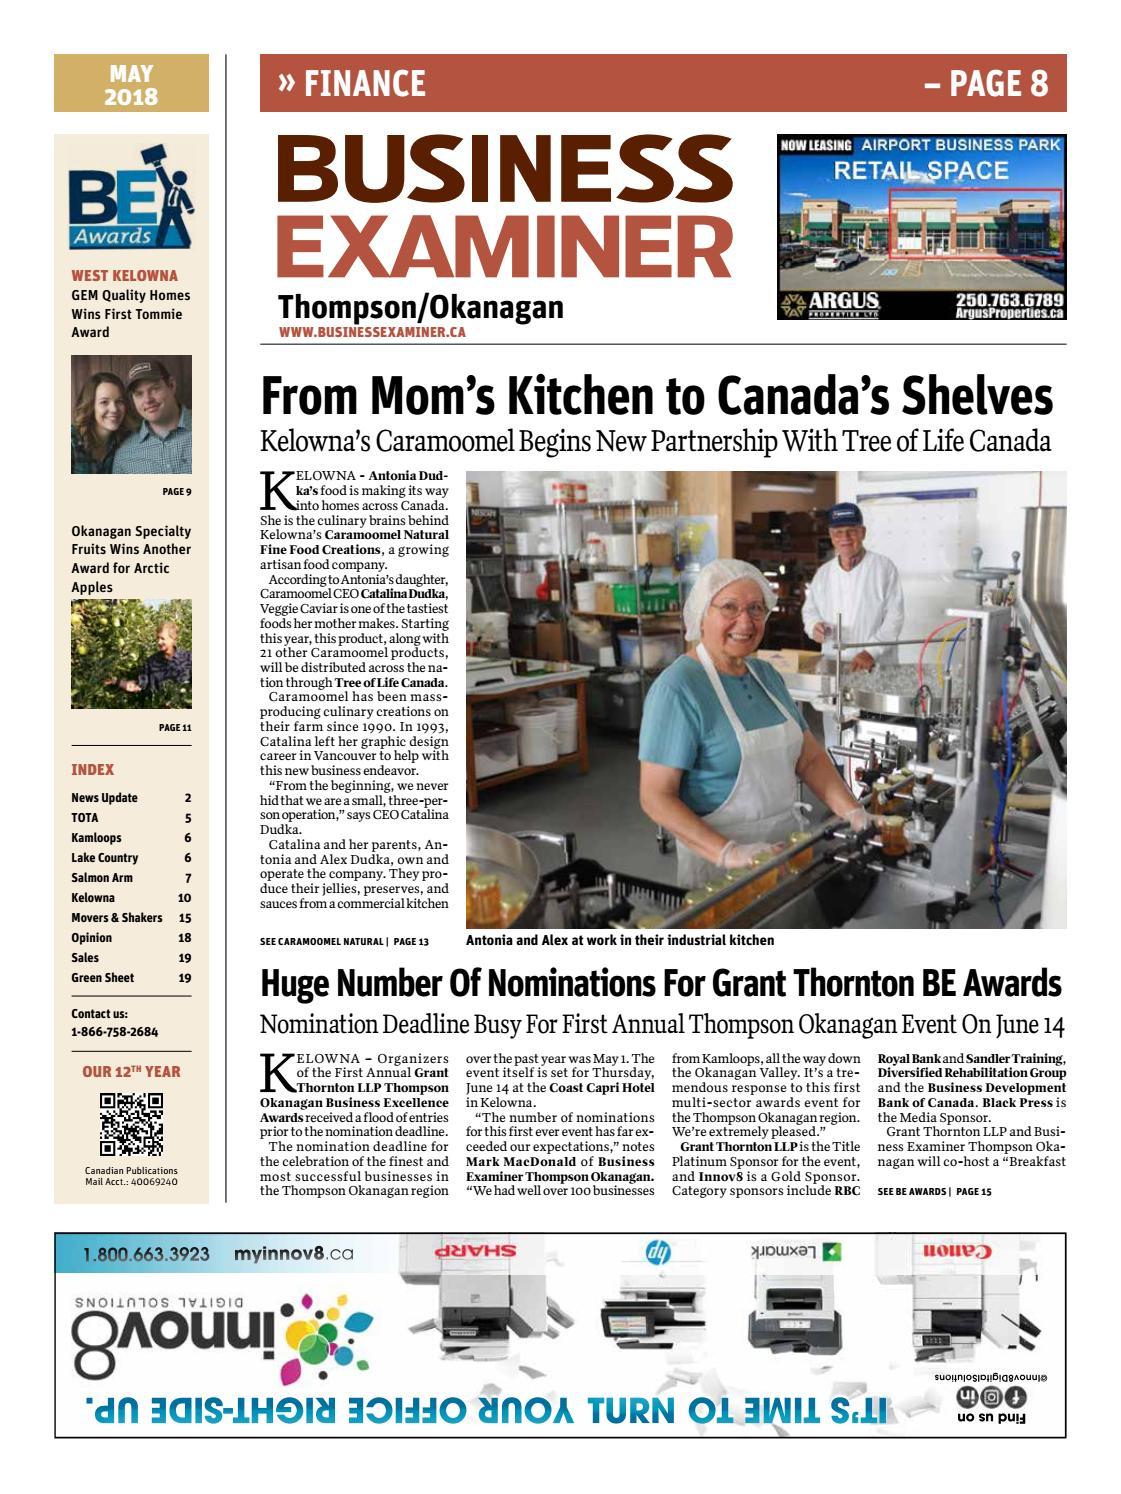 Business Examiner Thompson/Okanagan - MAY 2018 by Business Examiner ...